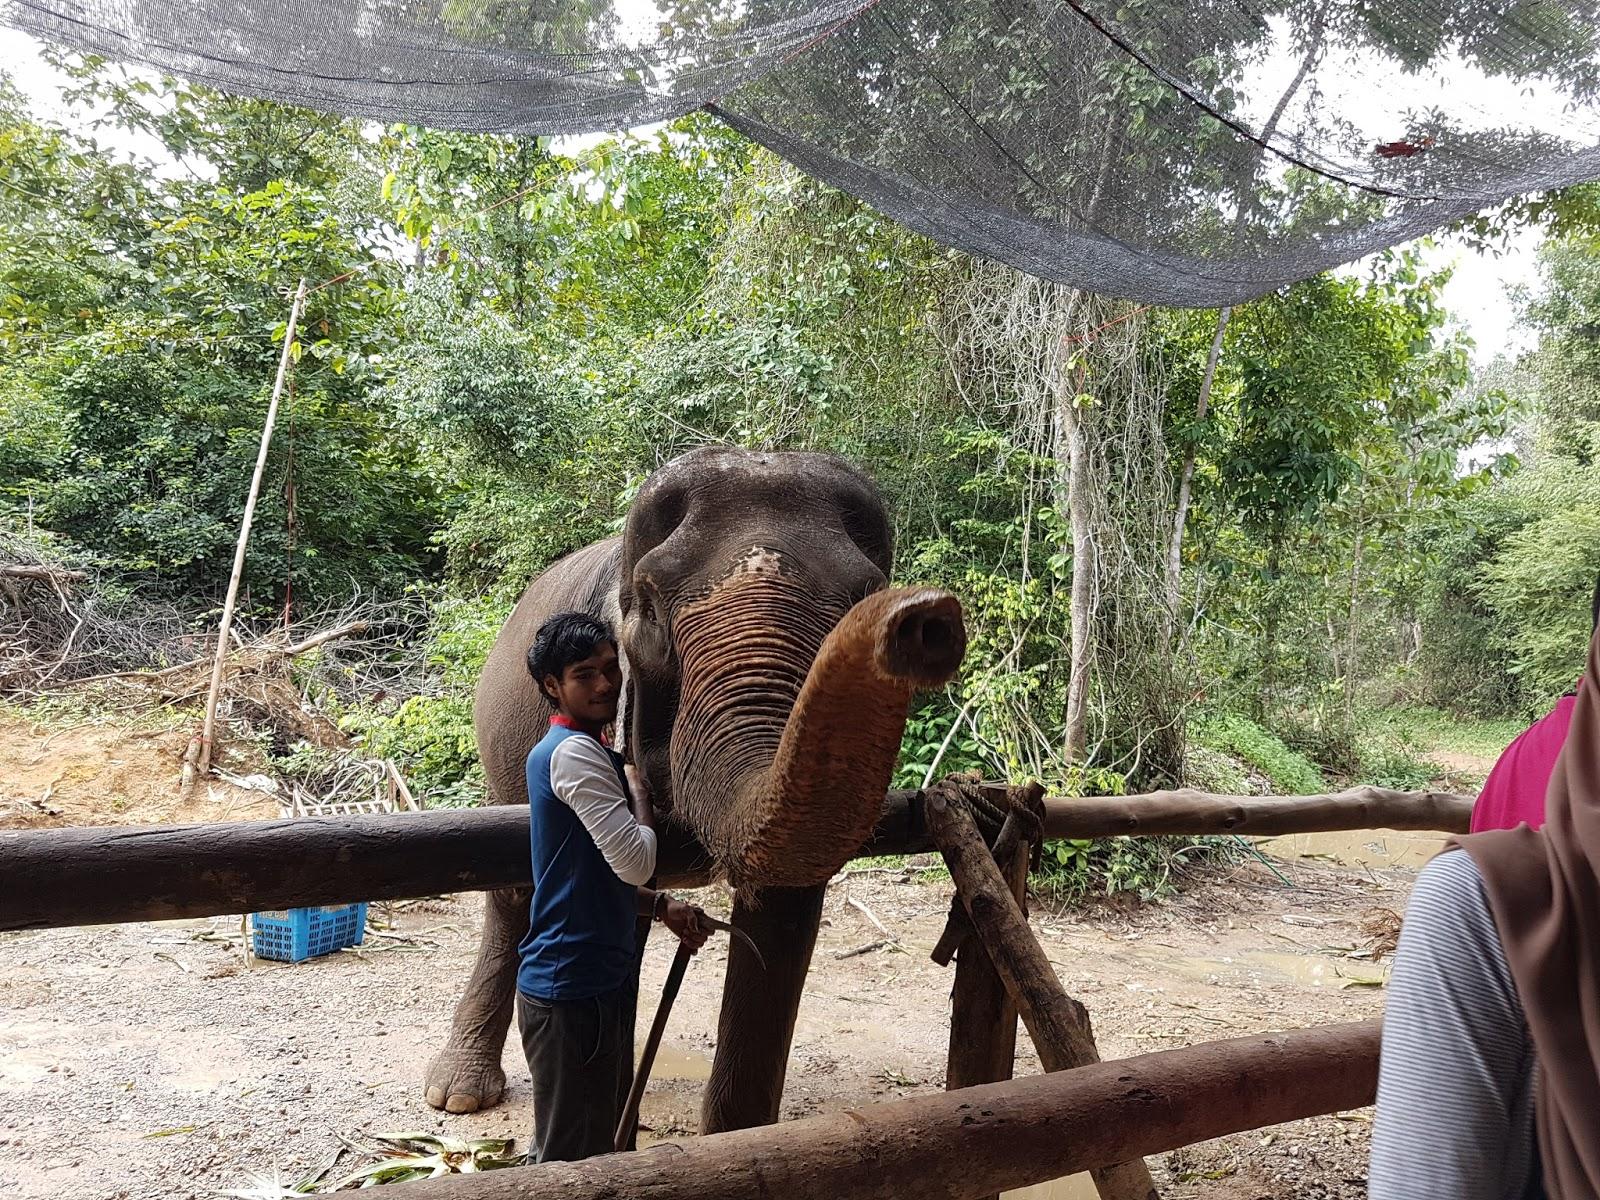 Trip Phuket Krabi Elephant Tracking Dan Hatyai Floating Market